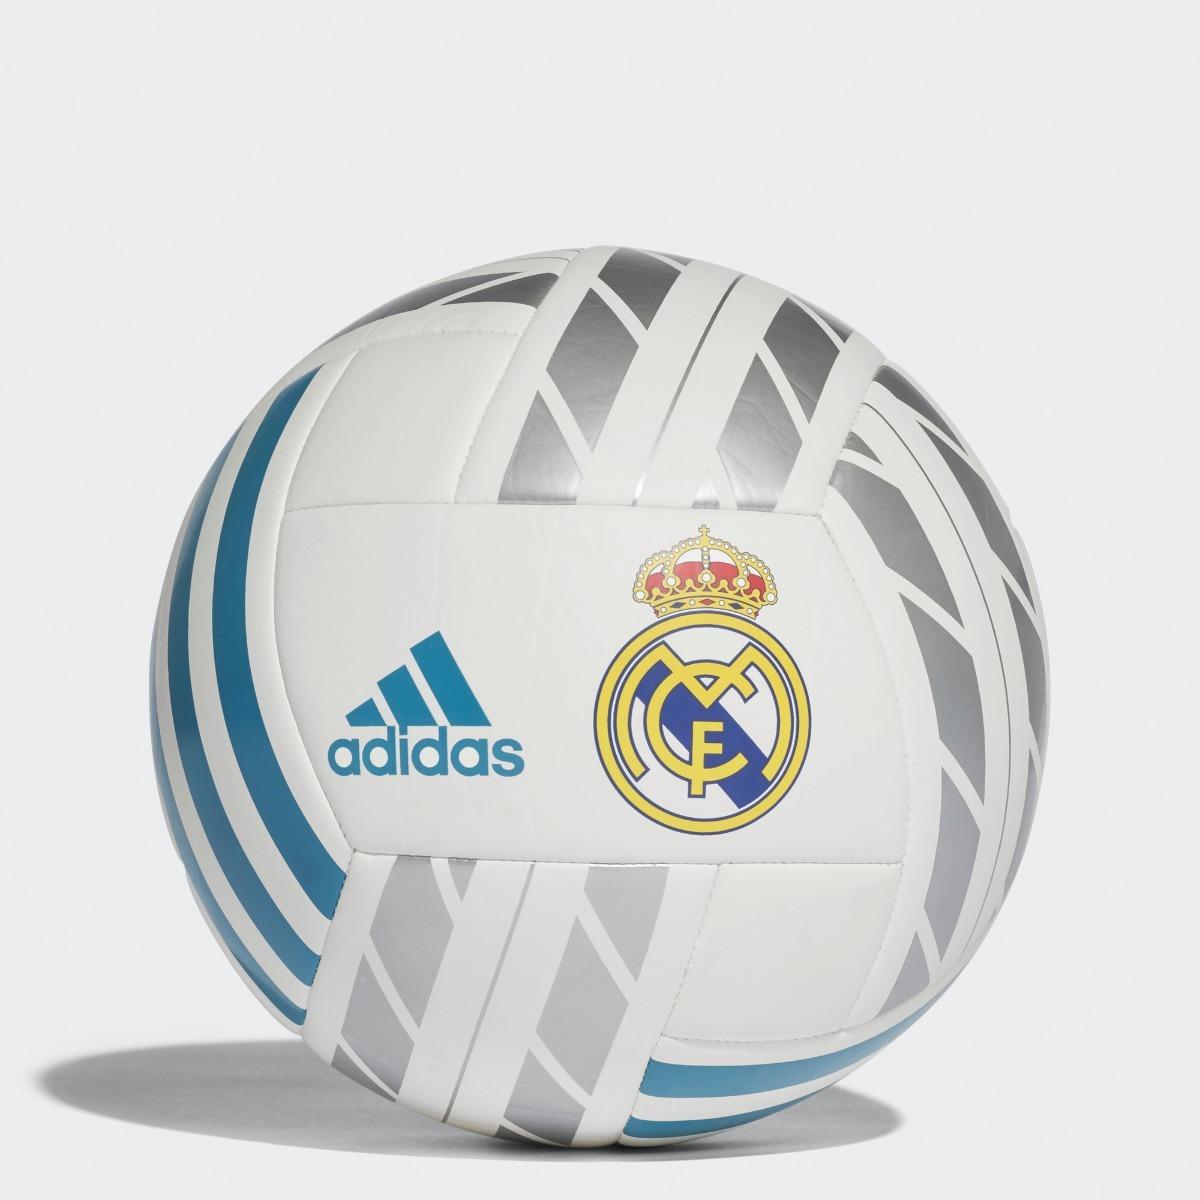 Pelota Fútbol adidas Real Madrid     On Sports     -   999 d05a52426a4f0